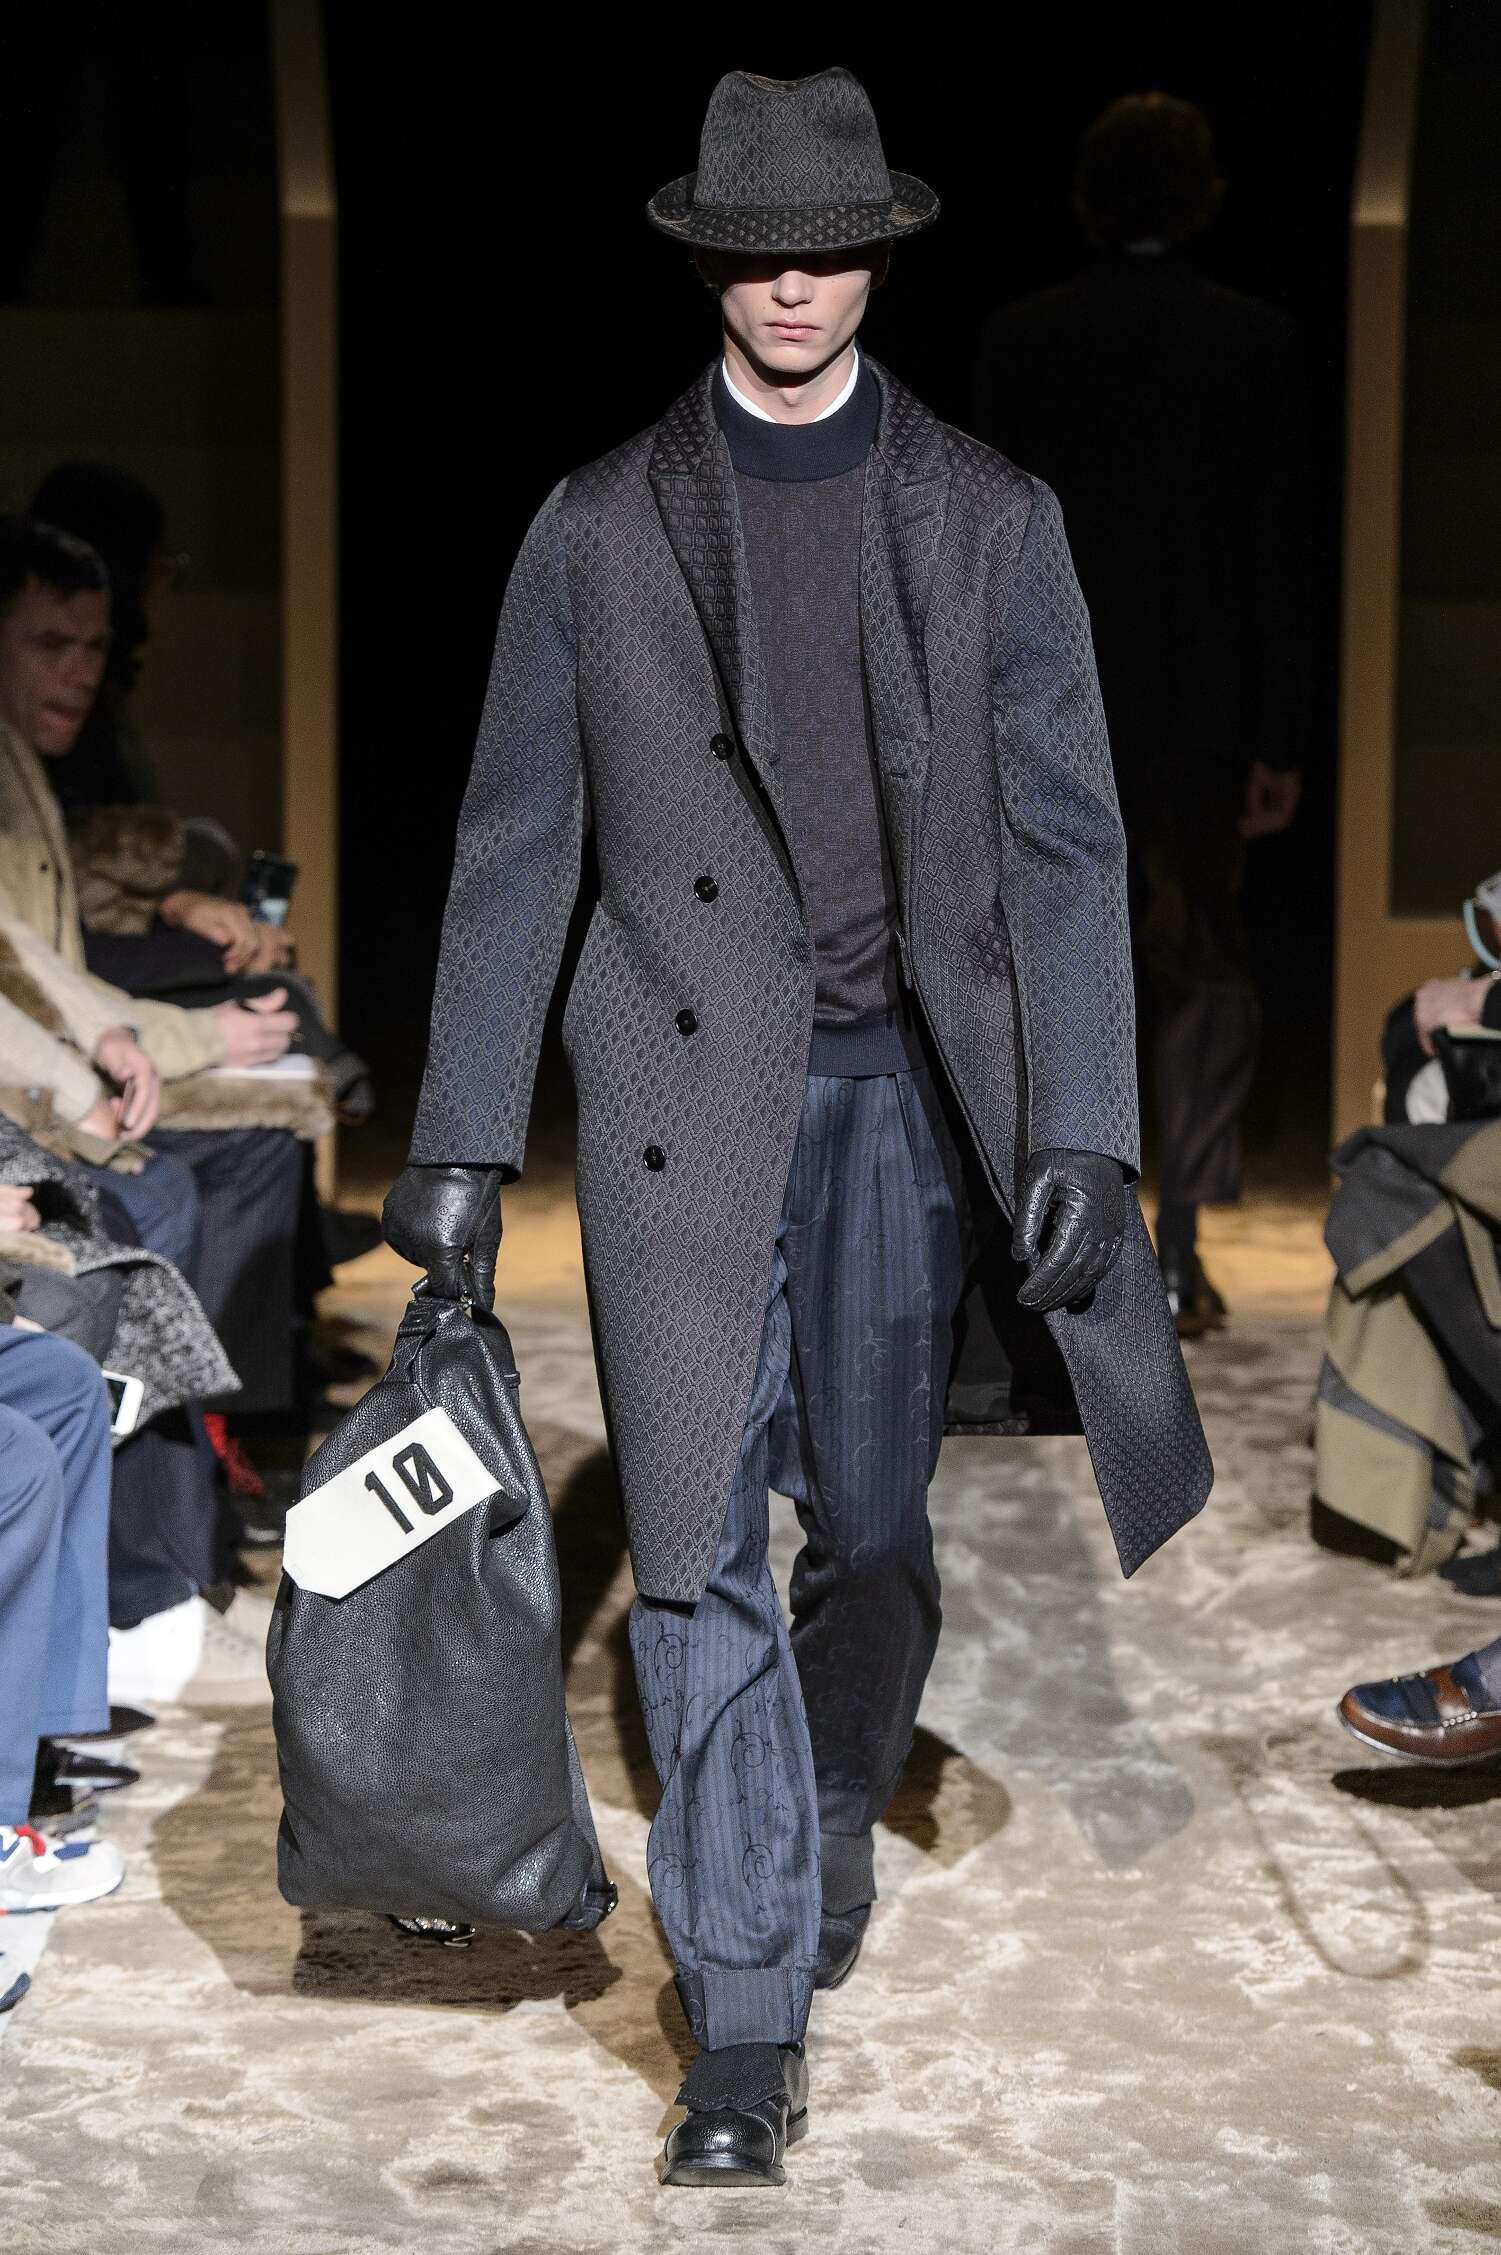 Ermenegildo Zegna Couture Fall Winter 2016 Mens Collection Milan Fashion Week